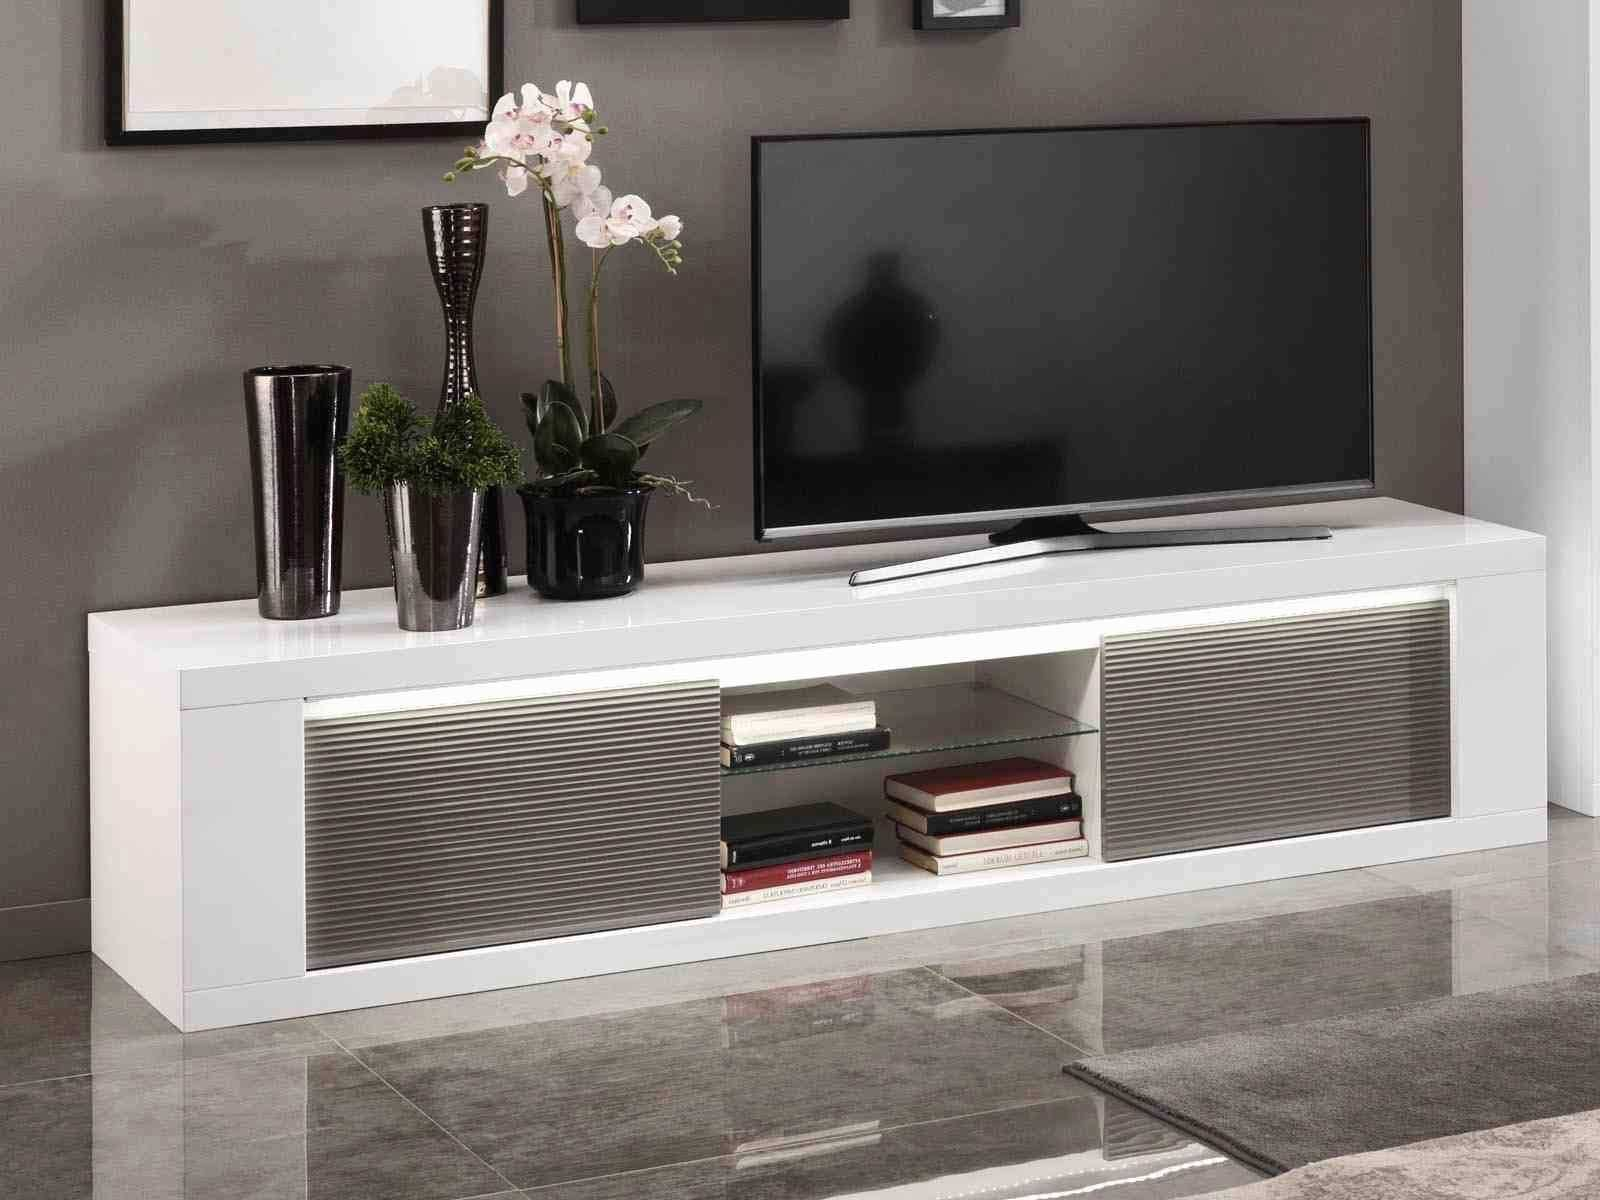 Meuble Tv Table Basse Meuble Tv Suspendu Gris Meuble Tv Gris Table